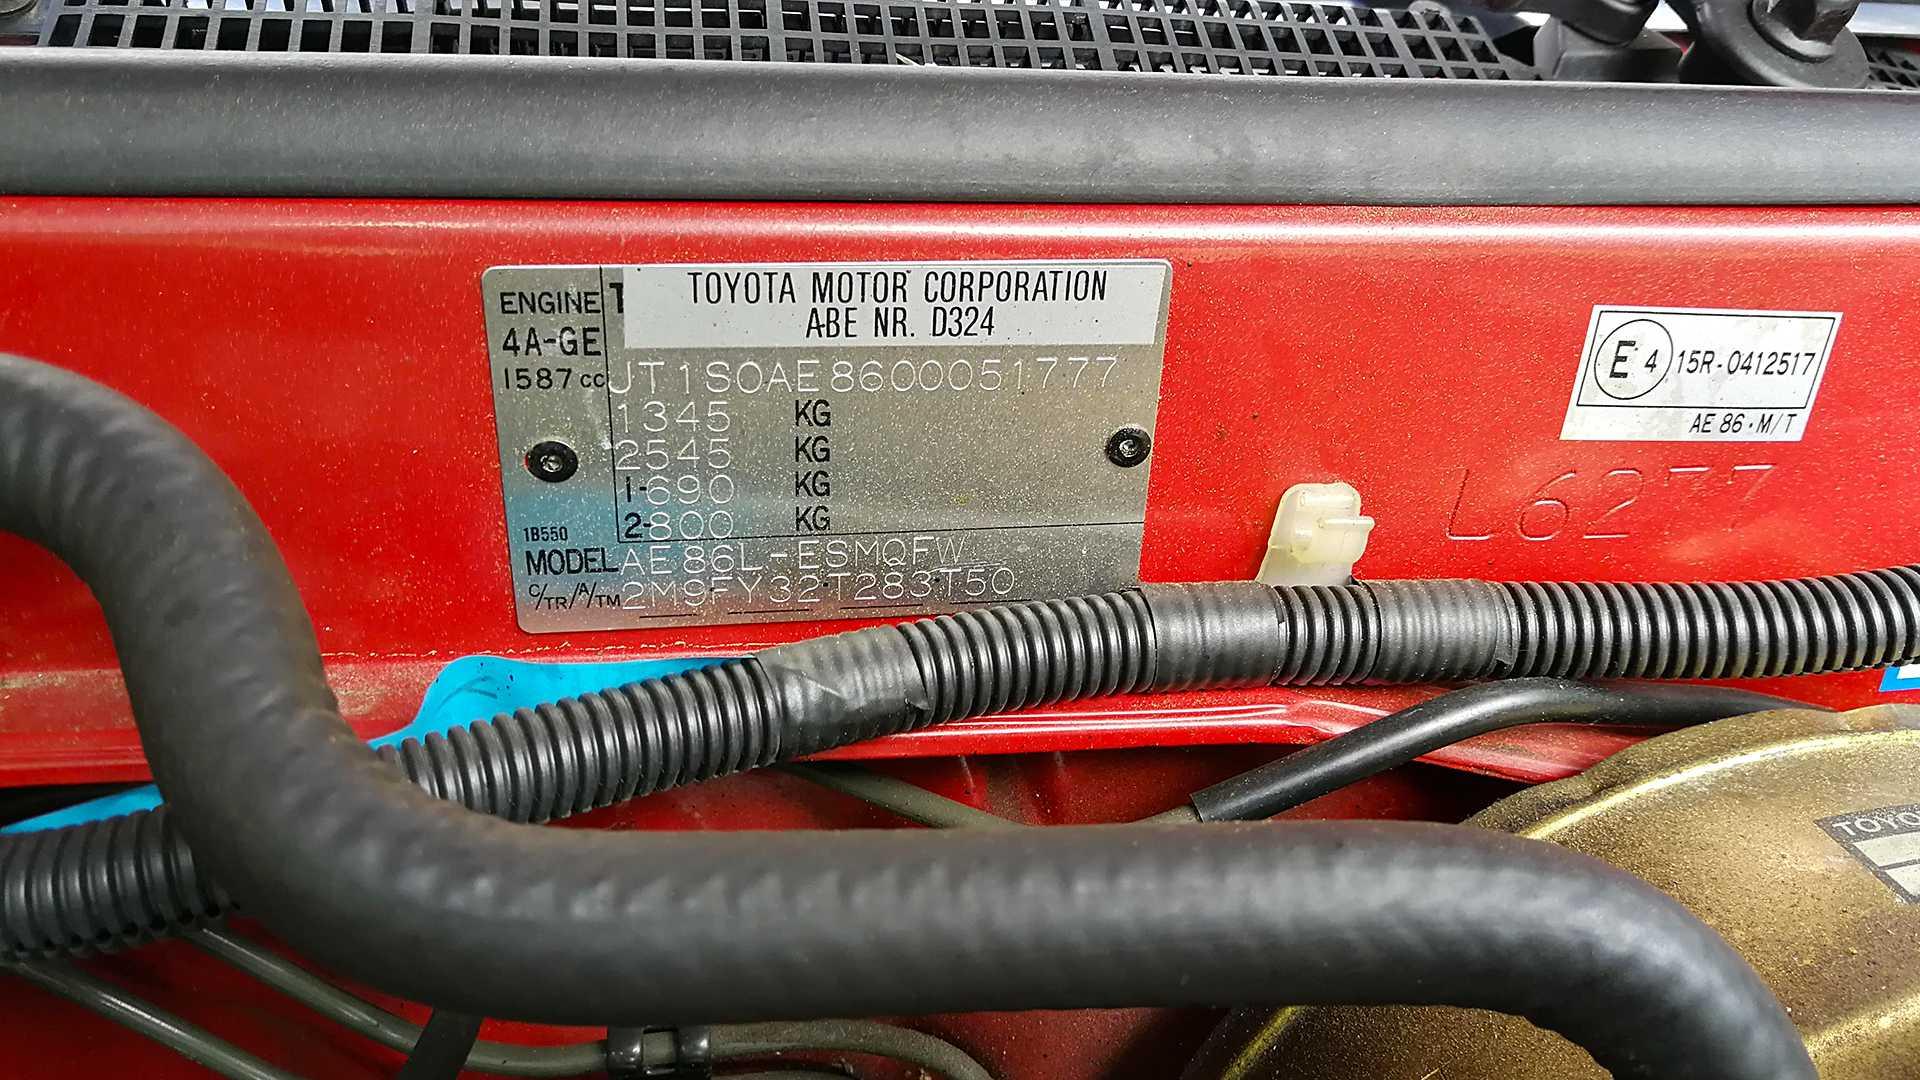 [Image: AEU86 AE86 - Help needed: firewall plates wanted]